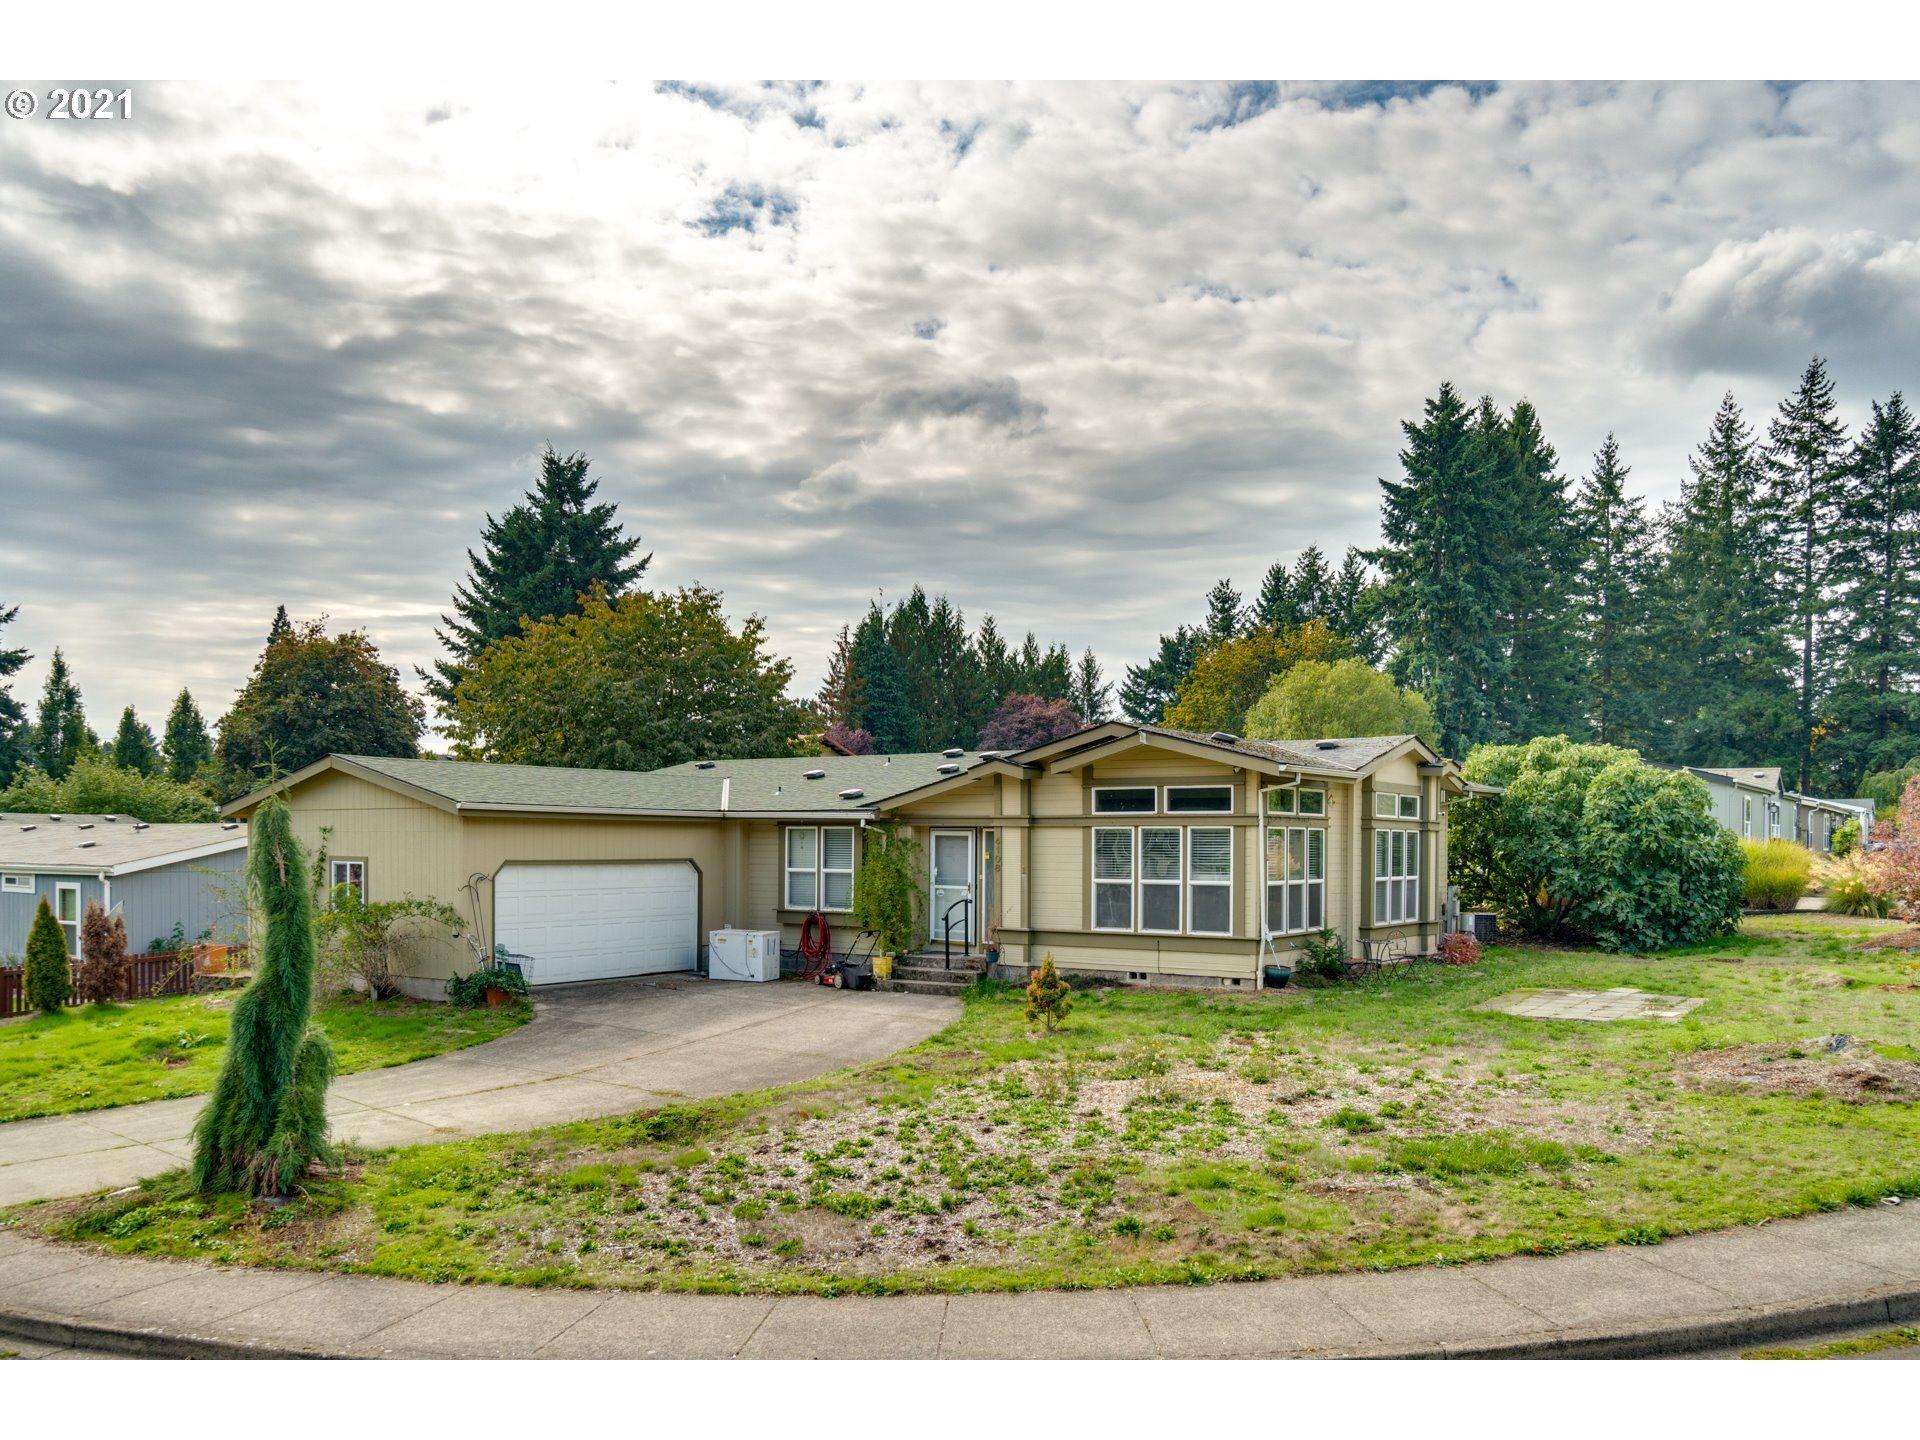 4108 NE 145TH AVE, Vancouver, WA 98682 - MLS#: 21132032